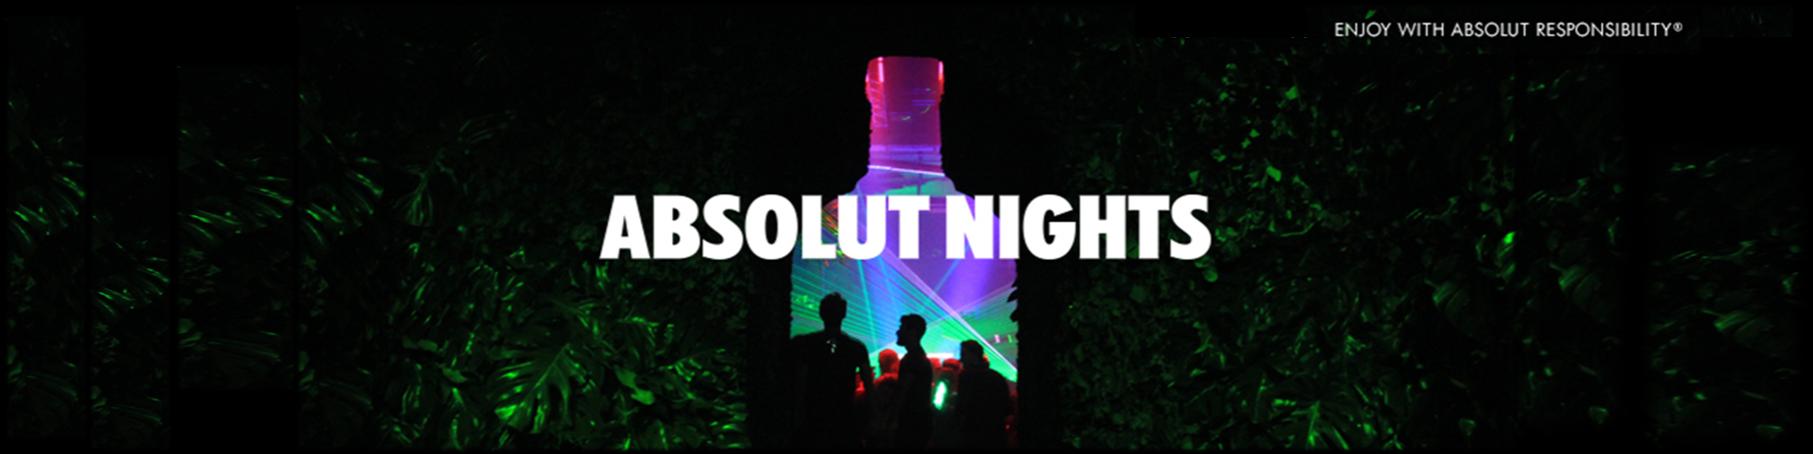 Absolut_Nights_Slider_ver02